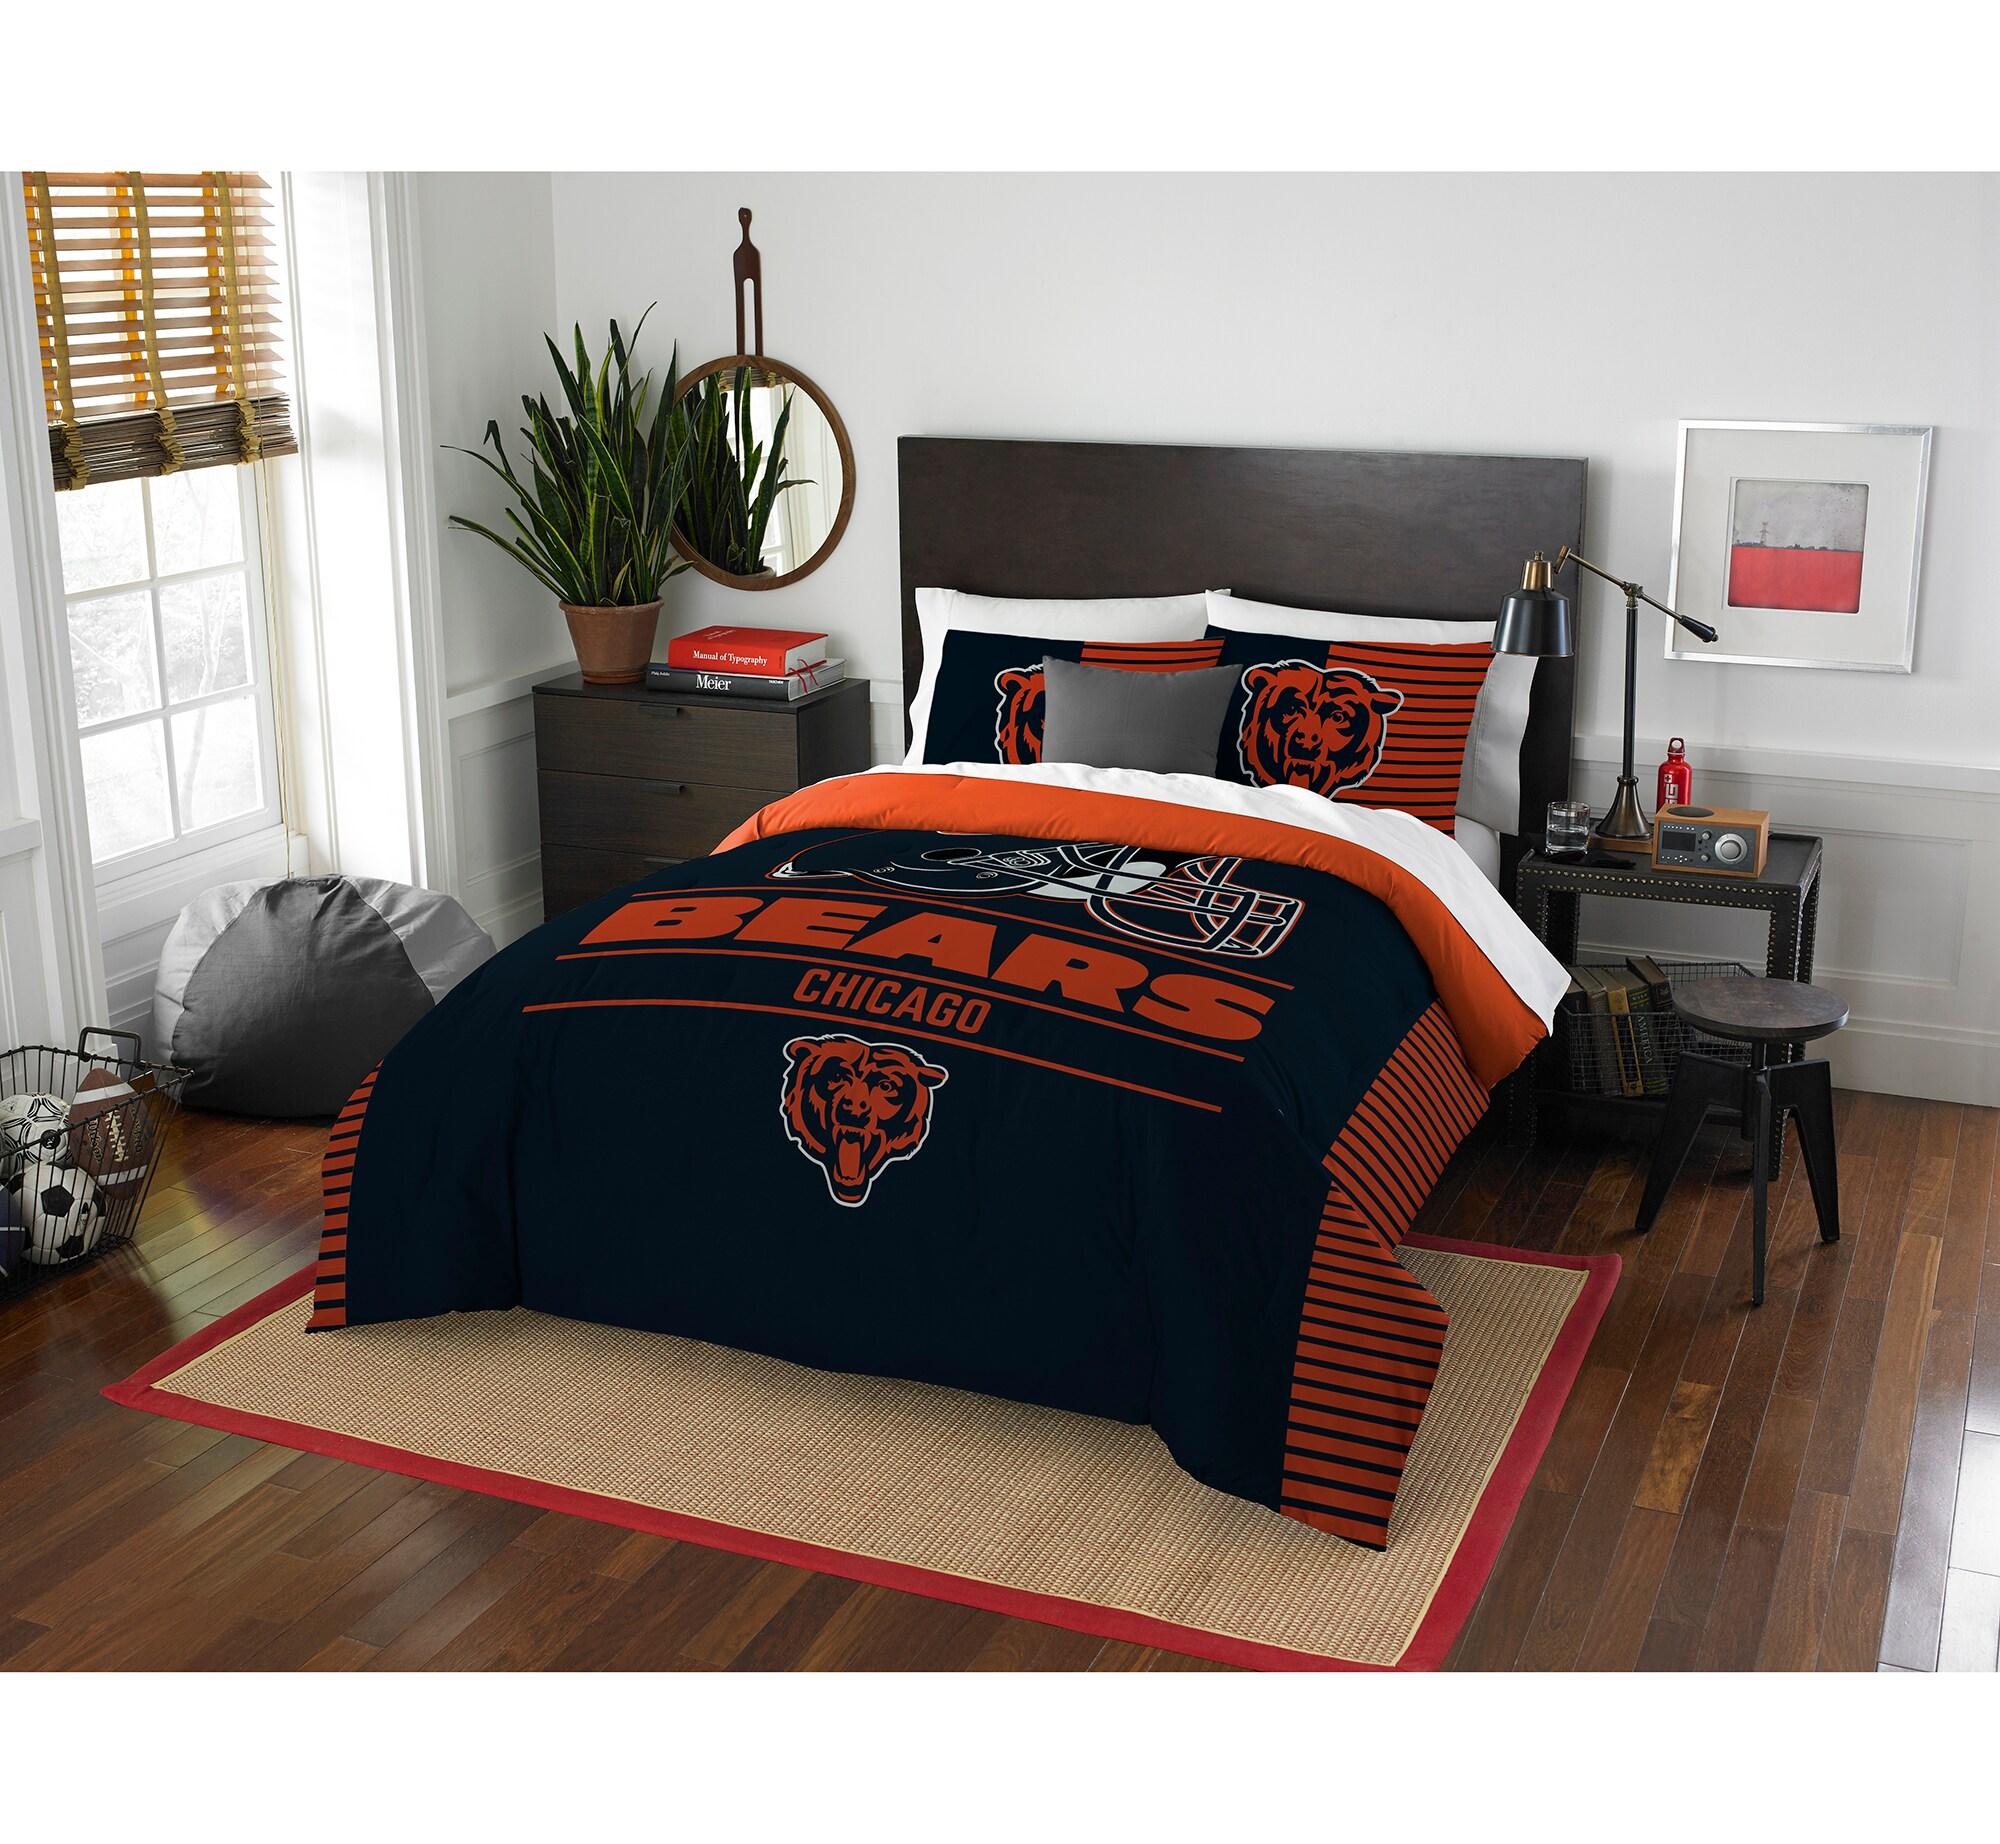 Chicago Bears The Northwest Company NFL Draft Full/Queen Comforter Set